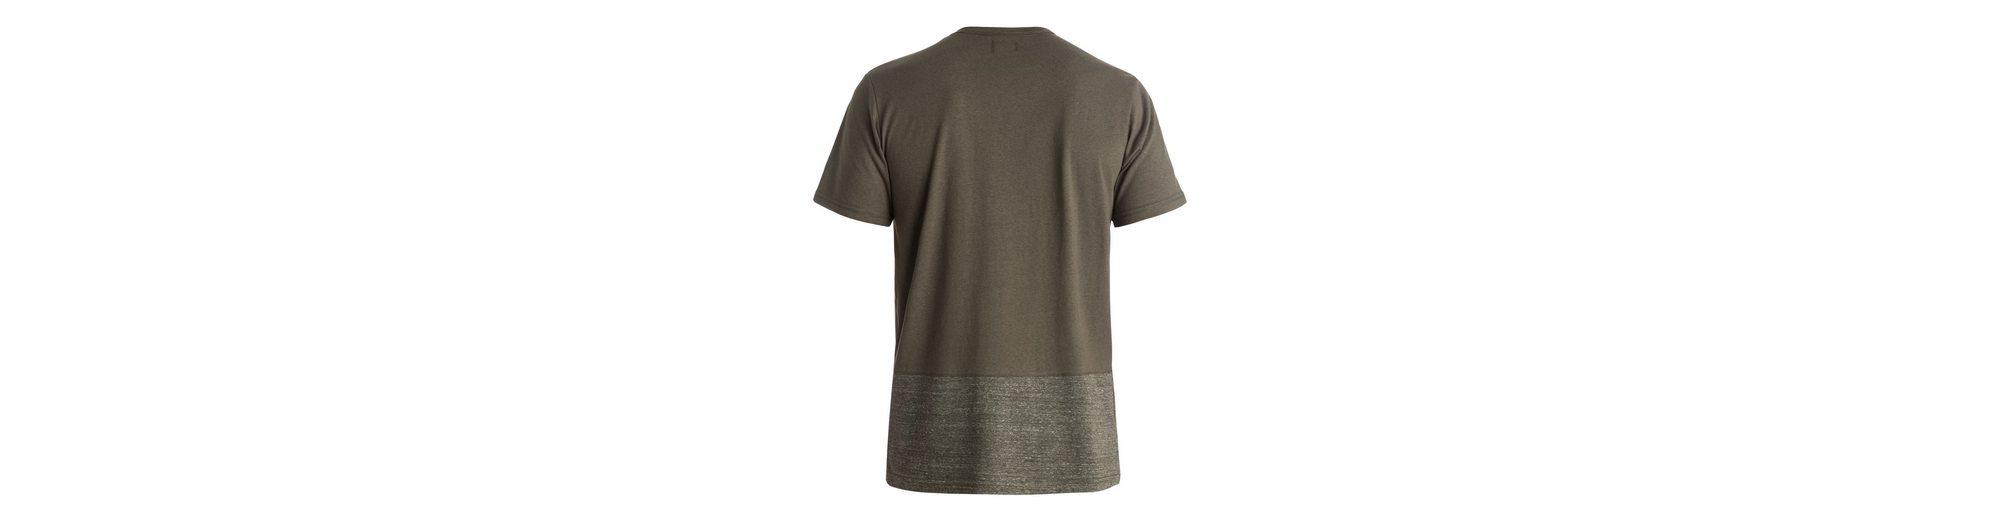 Original-Verkauf Footaction Günstig Online DC Shoes Pocket-T-Shirt Enderlin - Pocket-T-Shirt Online-Shopping-Spielraum SpLaPSlOmU